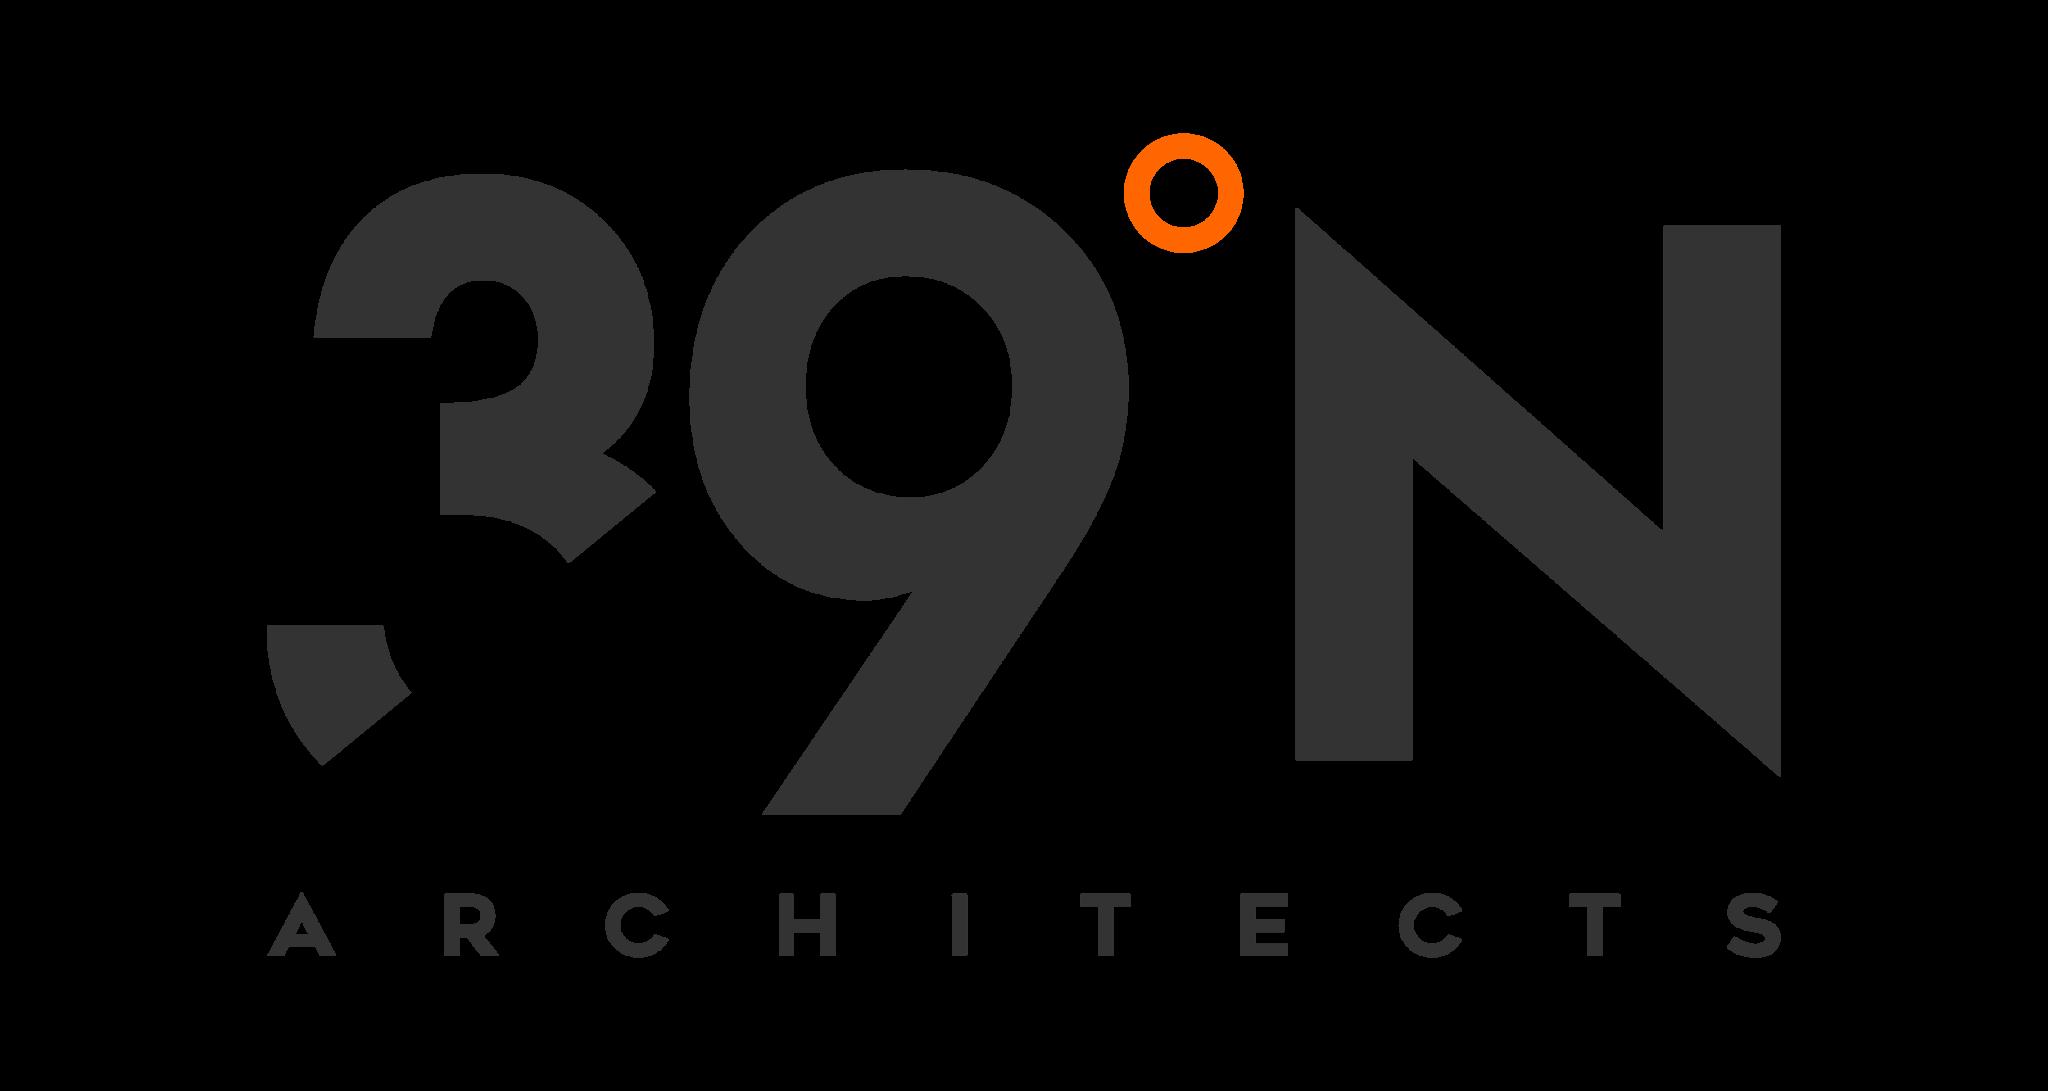 39-North-Architects-Logo